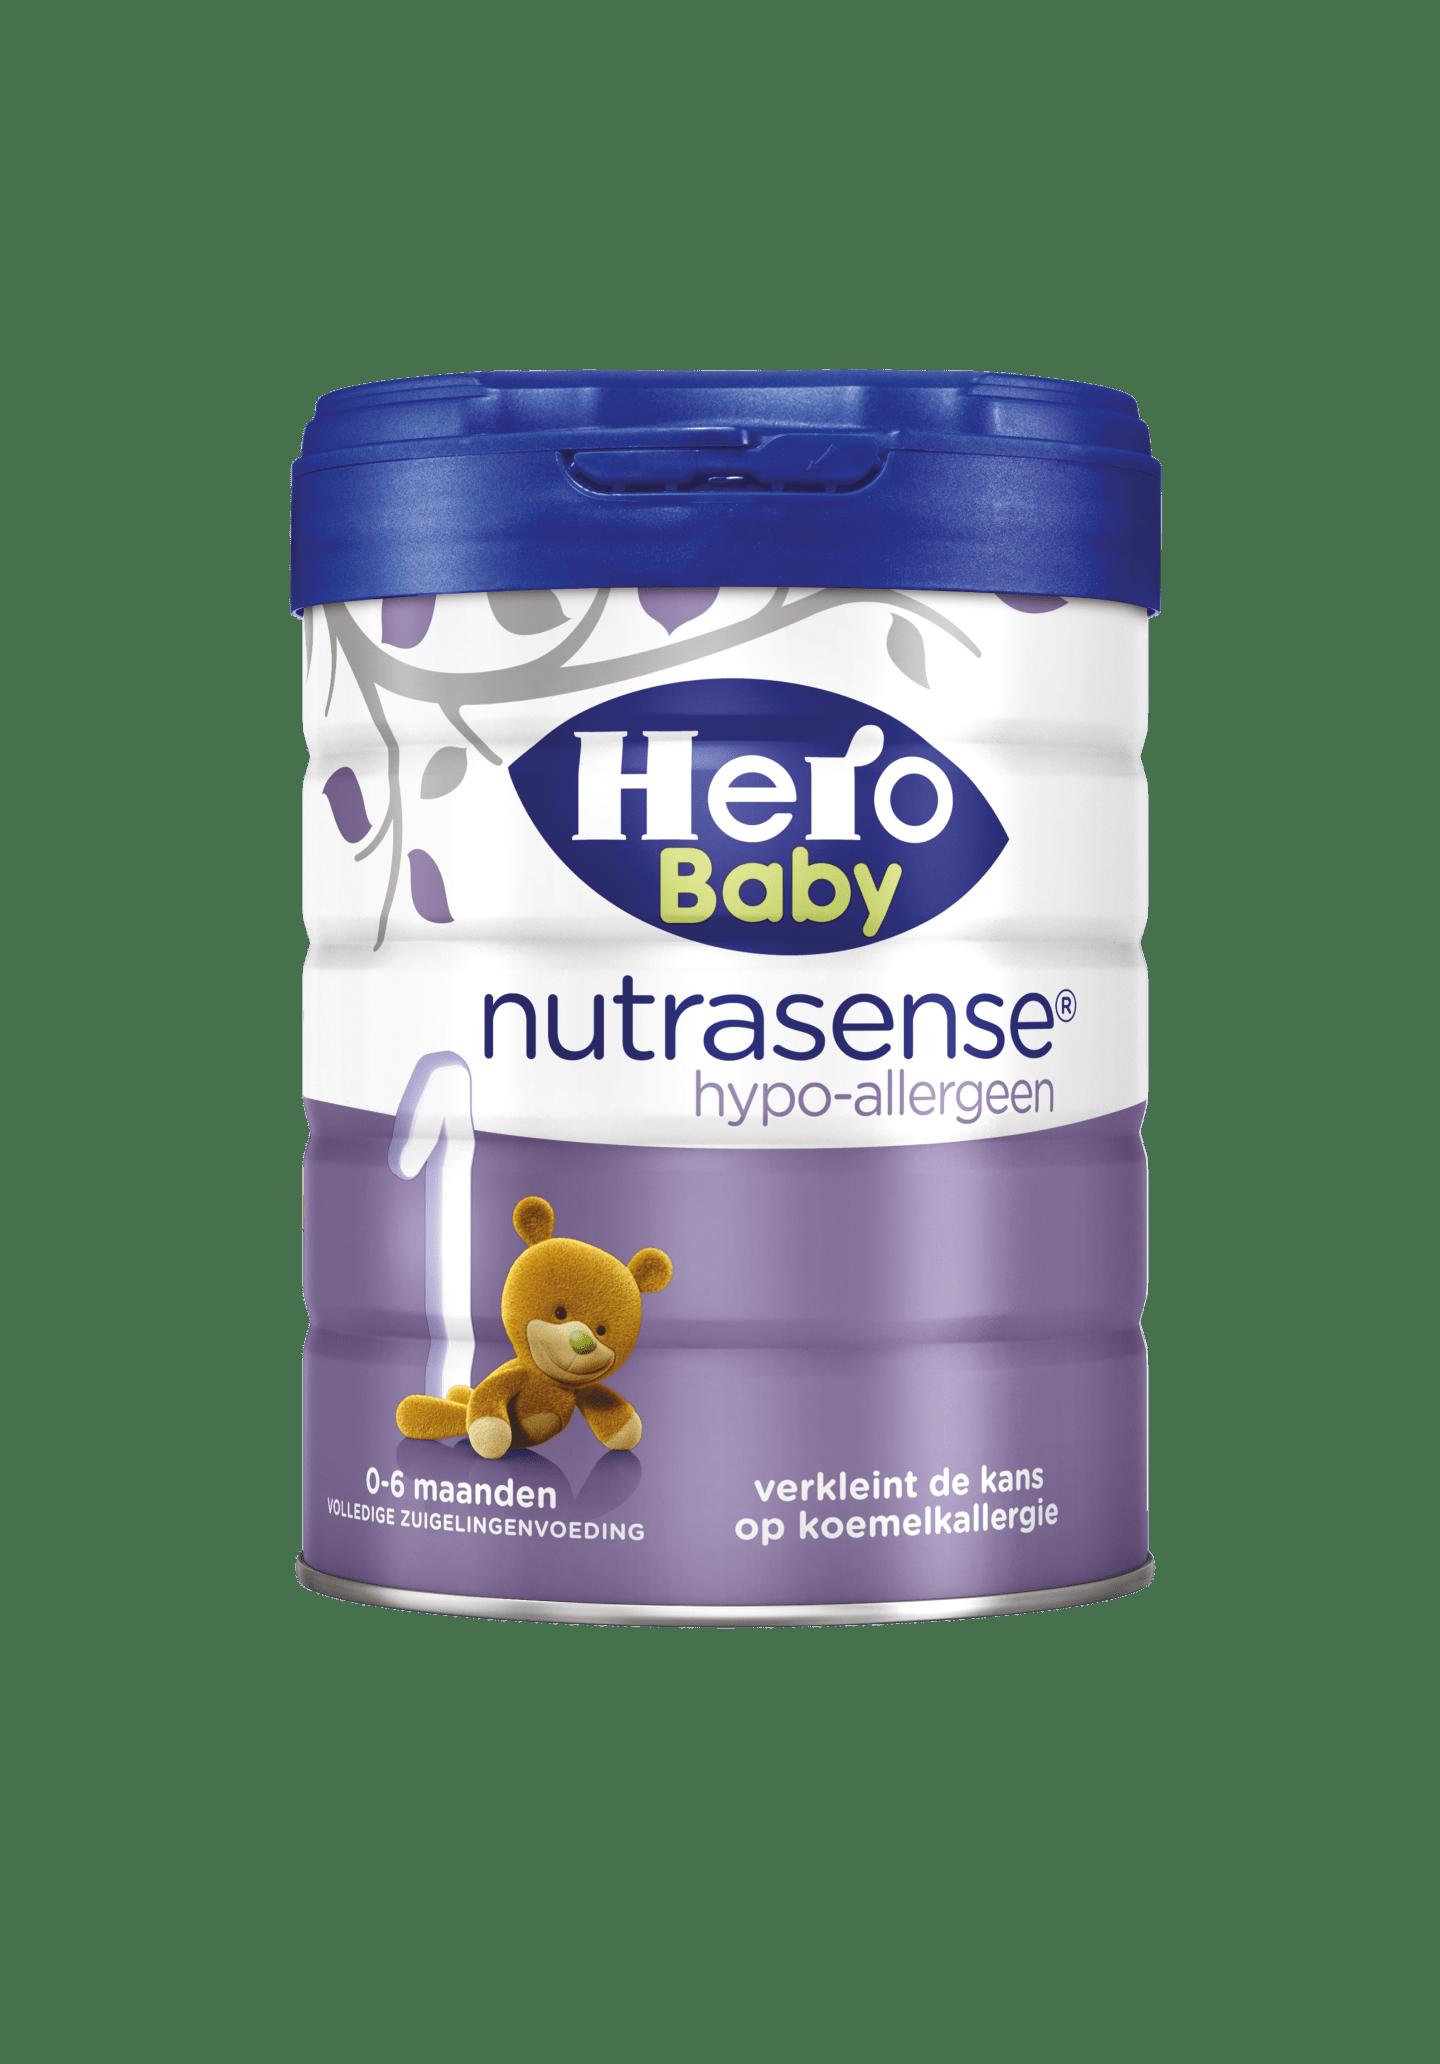 Hero Baby Nutrasense® Hypo-Allergeen 1